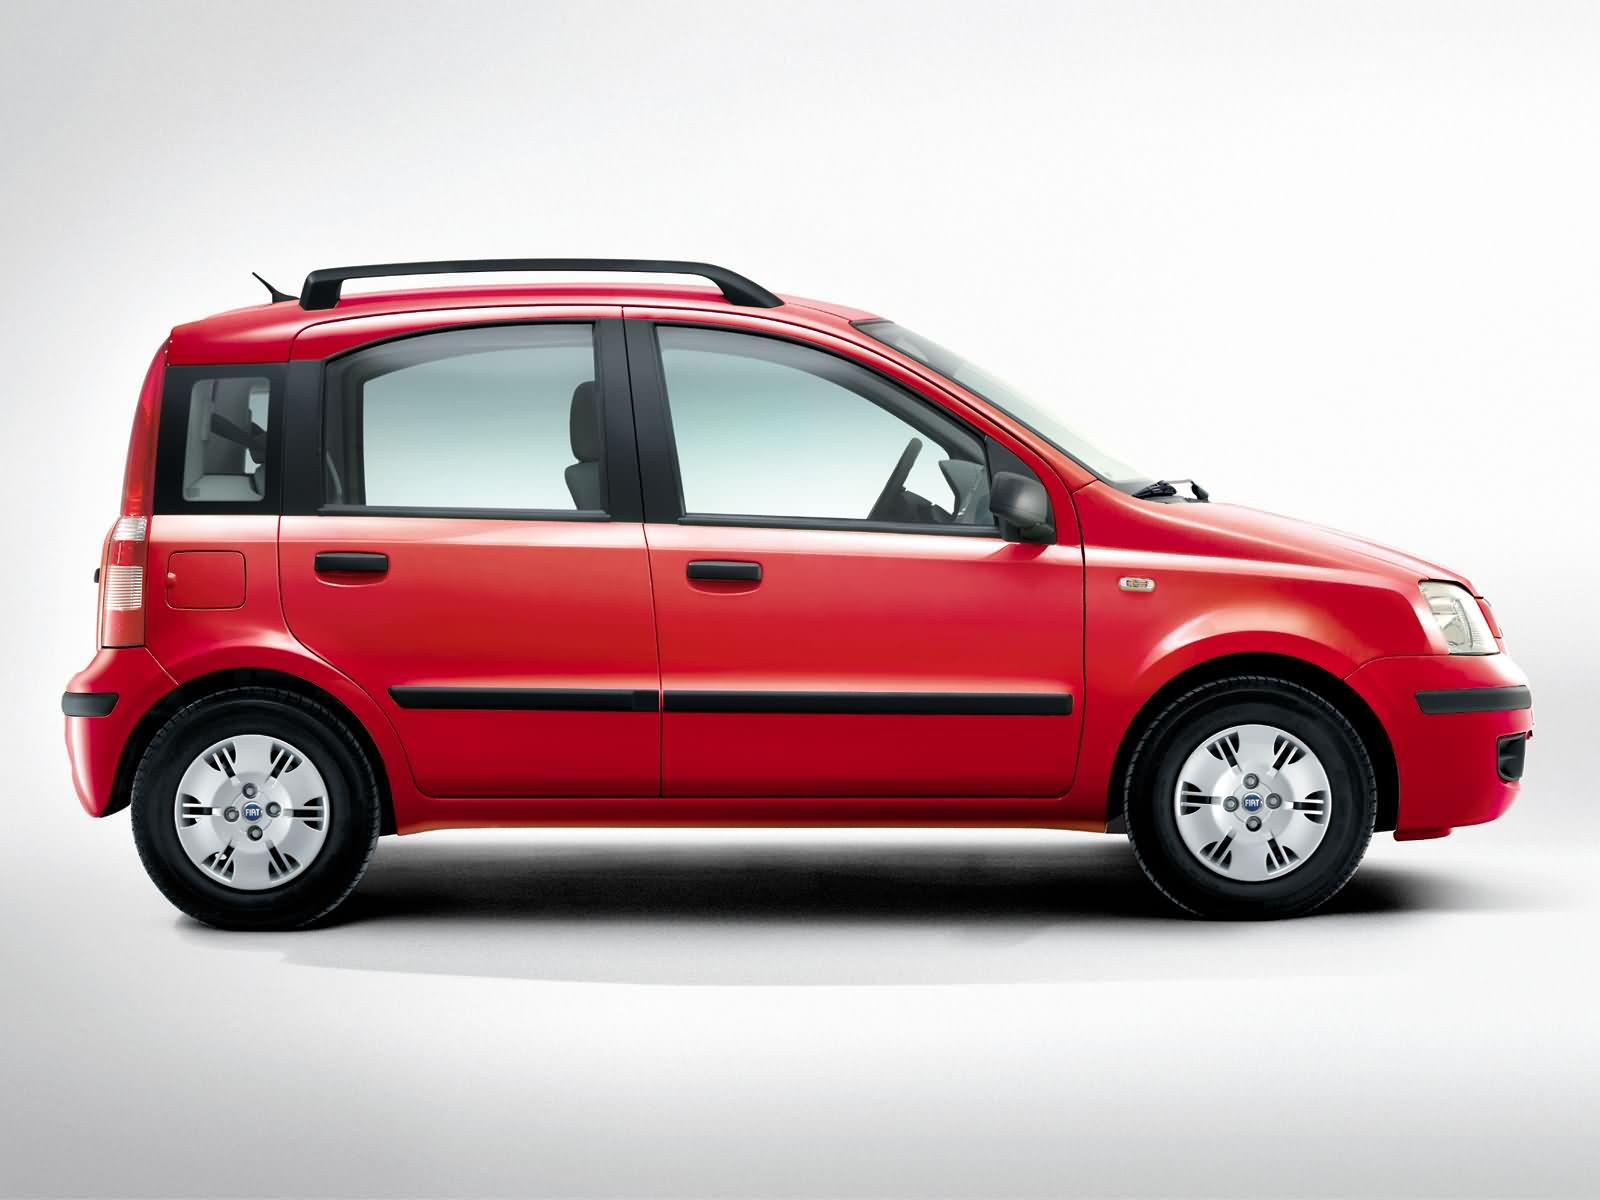 Fiat Panda Wallpaper 16   1600 X 1200 stmednet 1600x1200